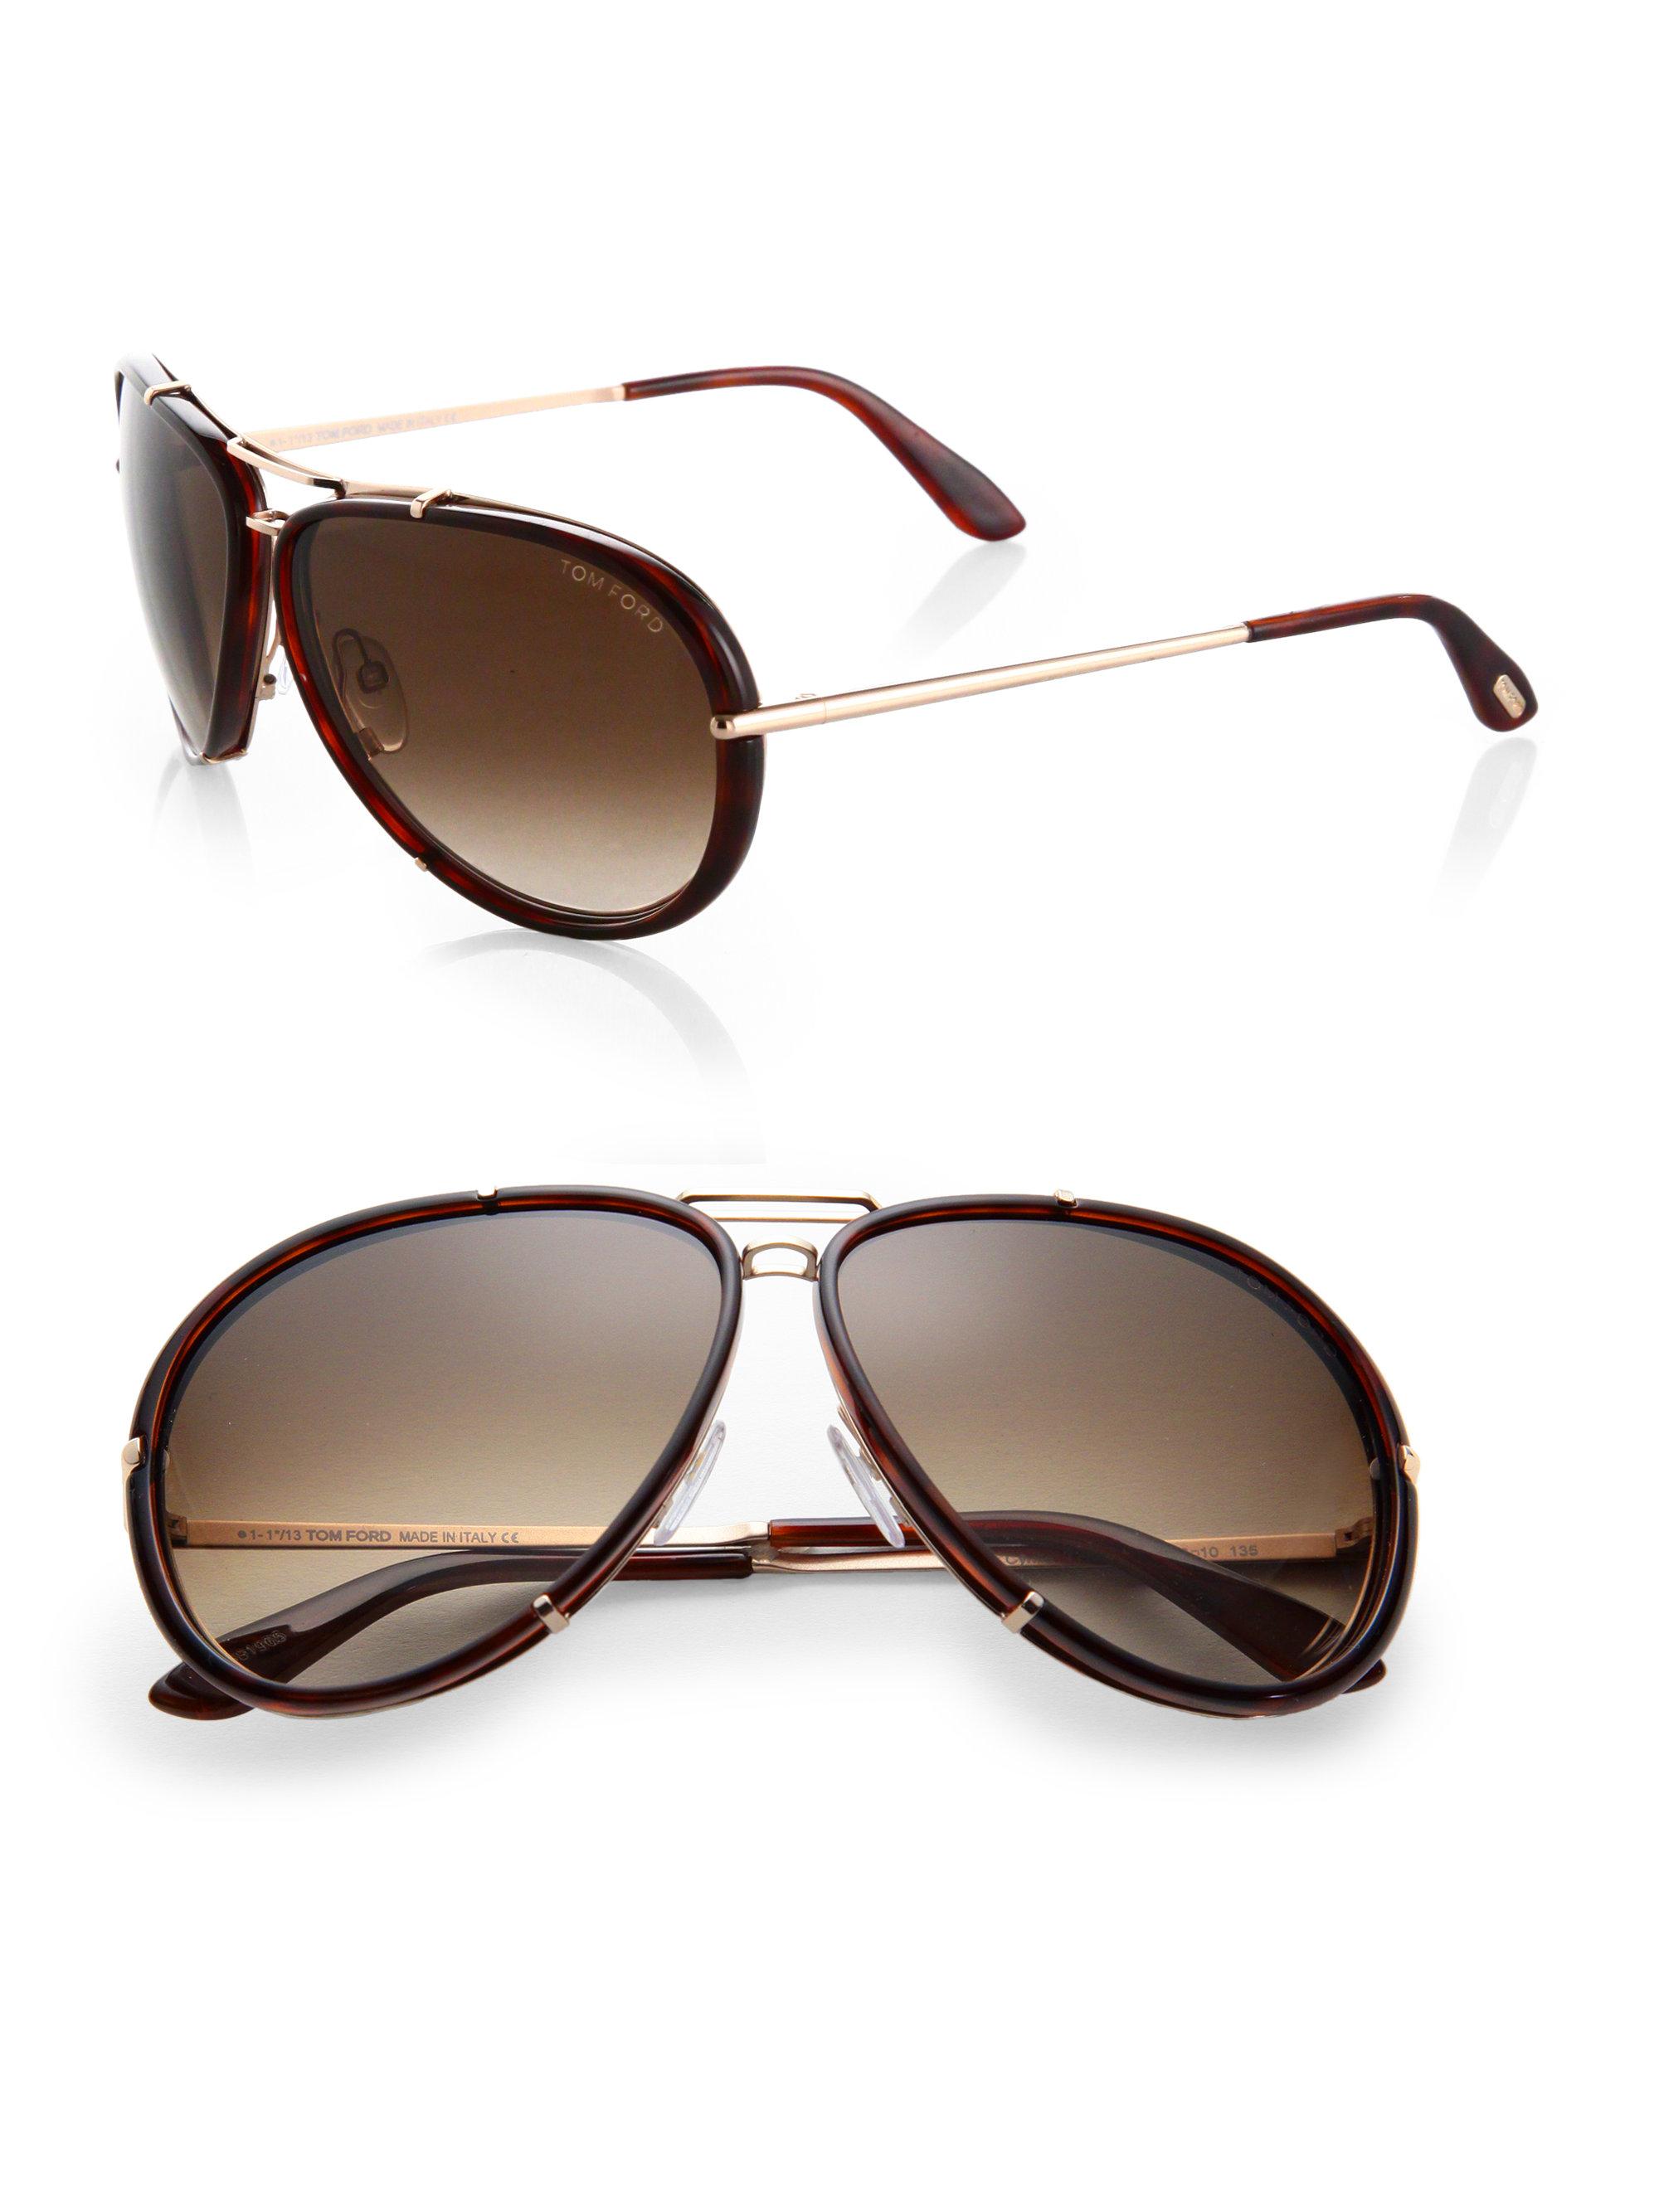 019d57da505d Tom Ford Cyrille 63Mm Aviator Sunglasses in Brown